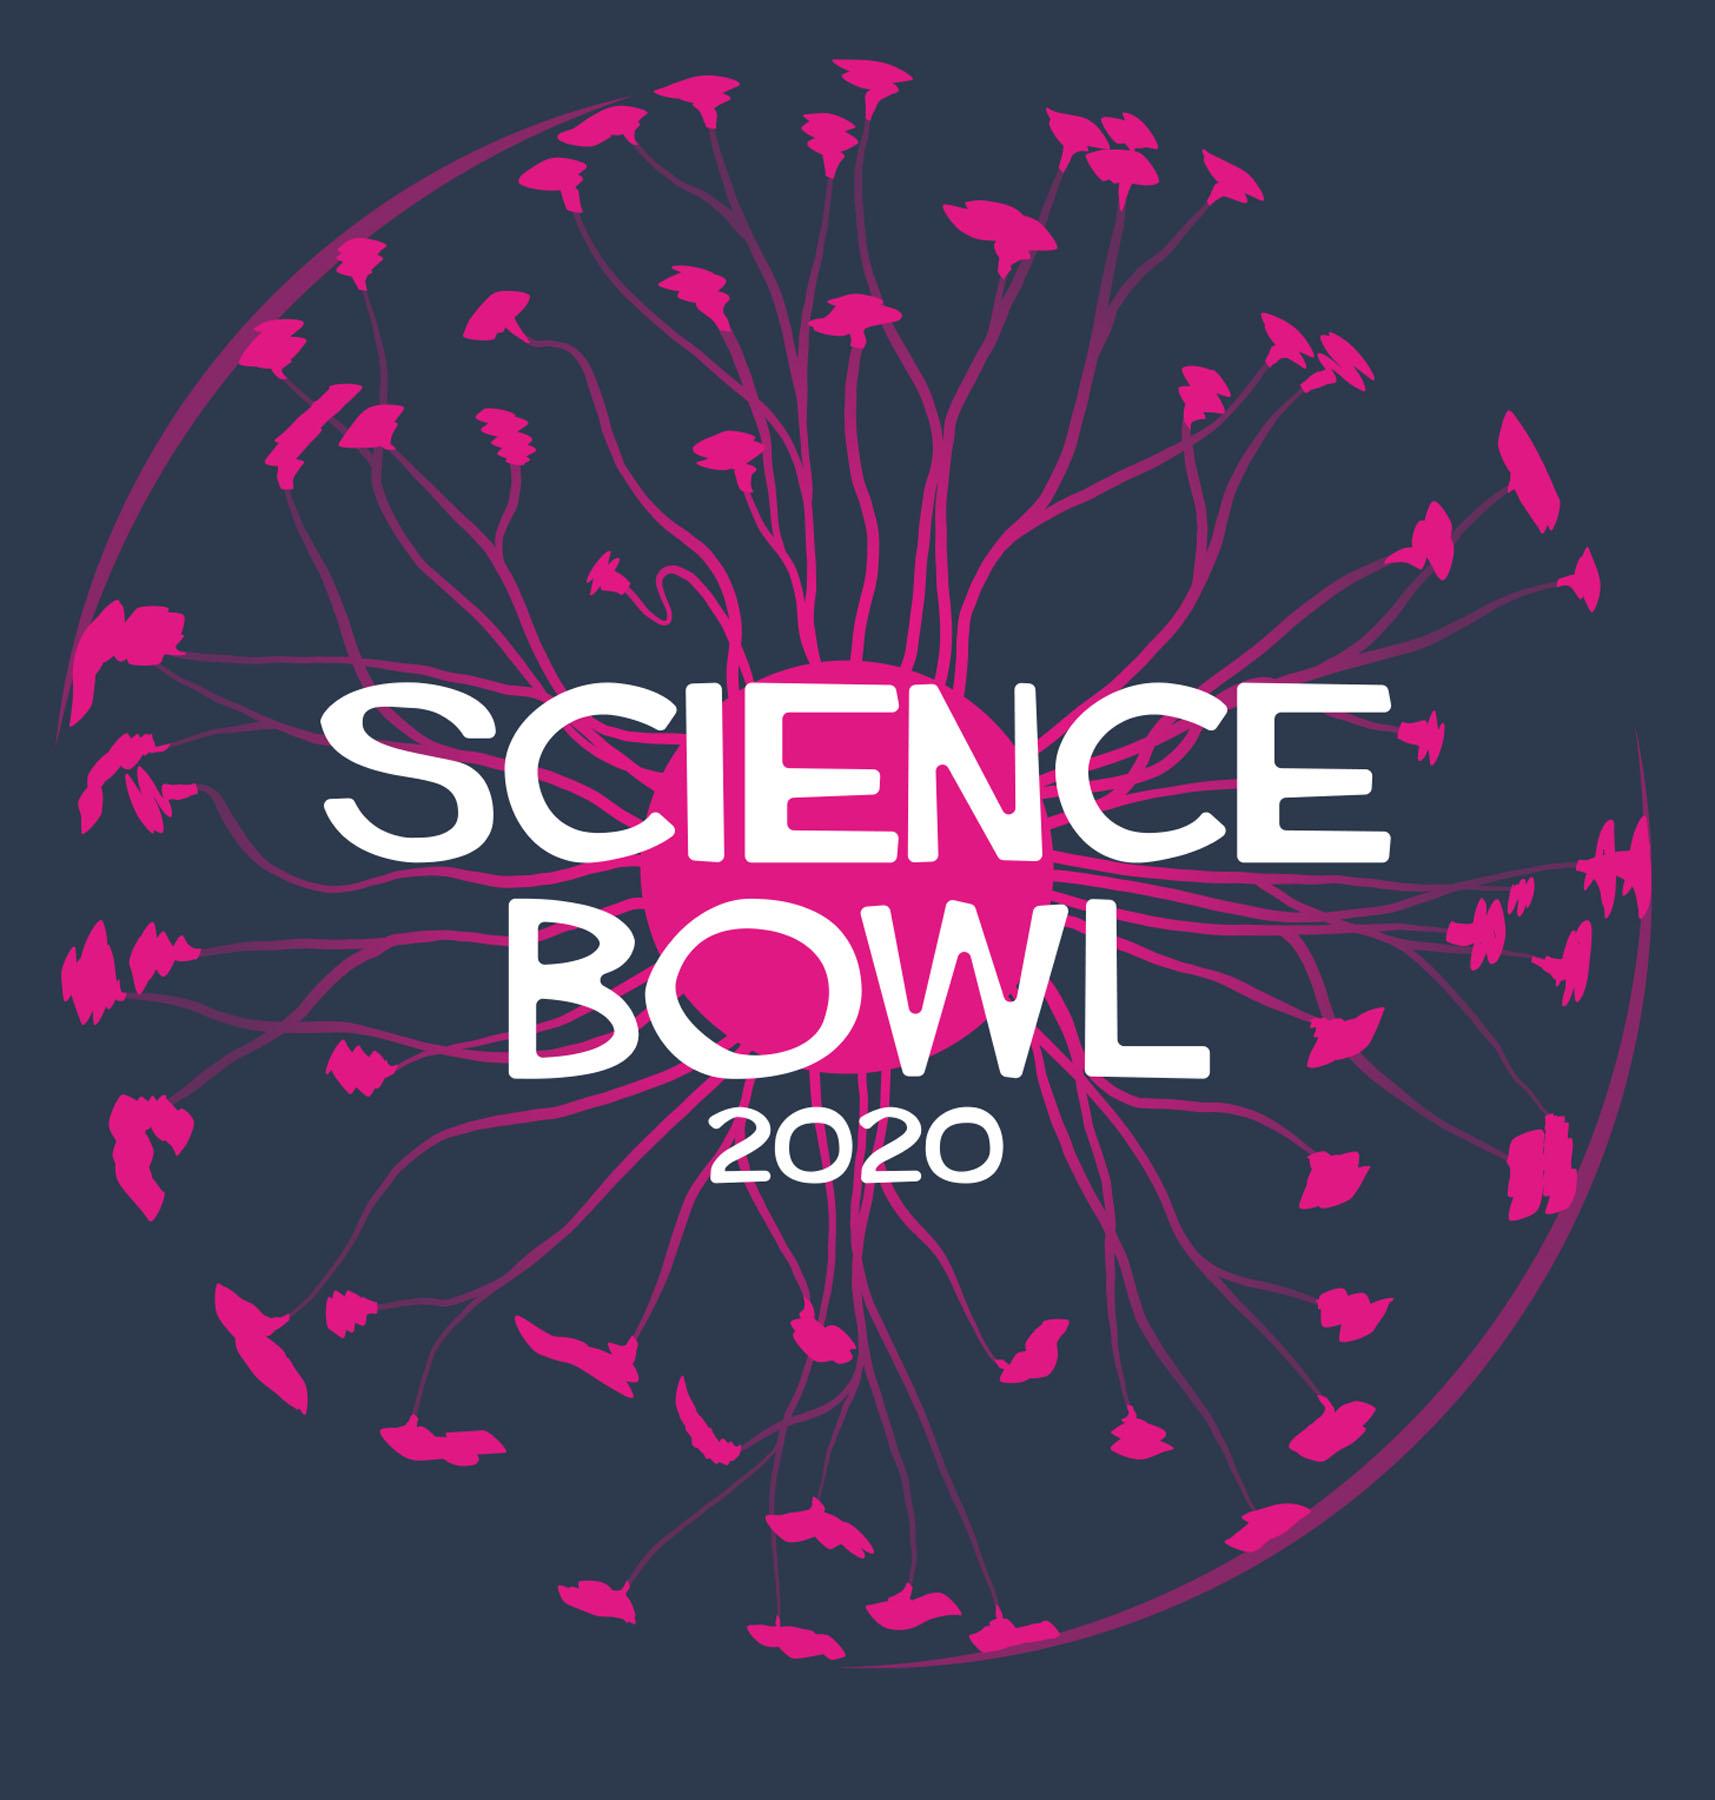 Science Bowl 2020 Branding